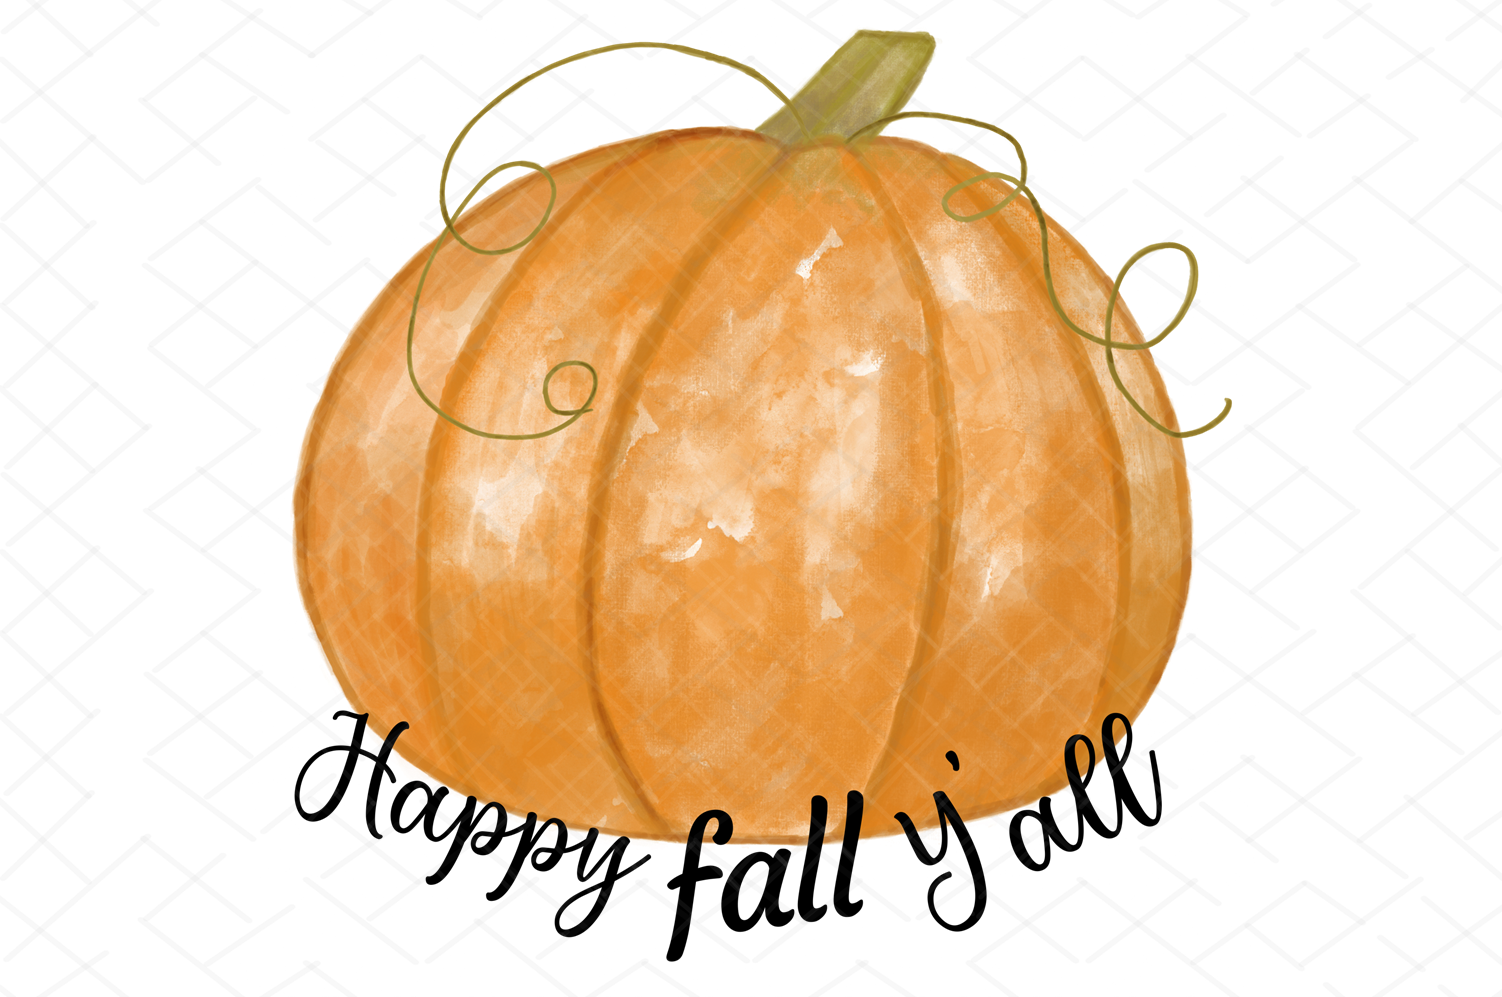 Happy Fall Y'all Watercolor Pumpkin Sublimation Clipart example image 2